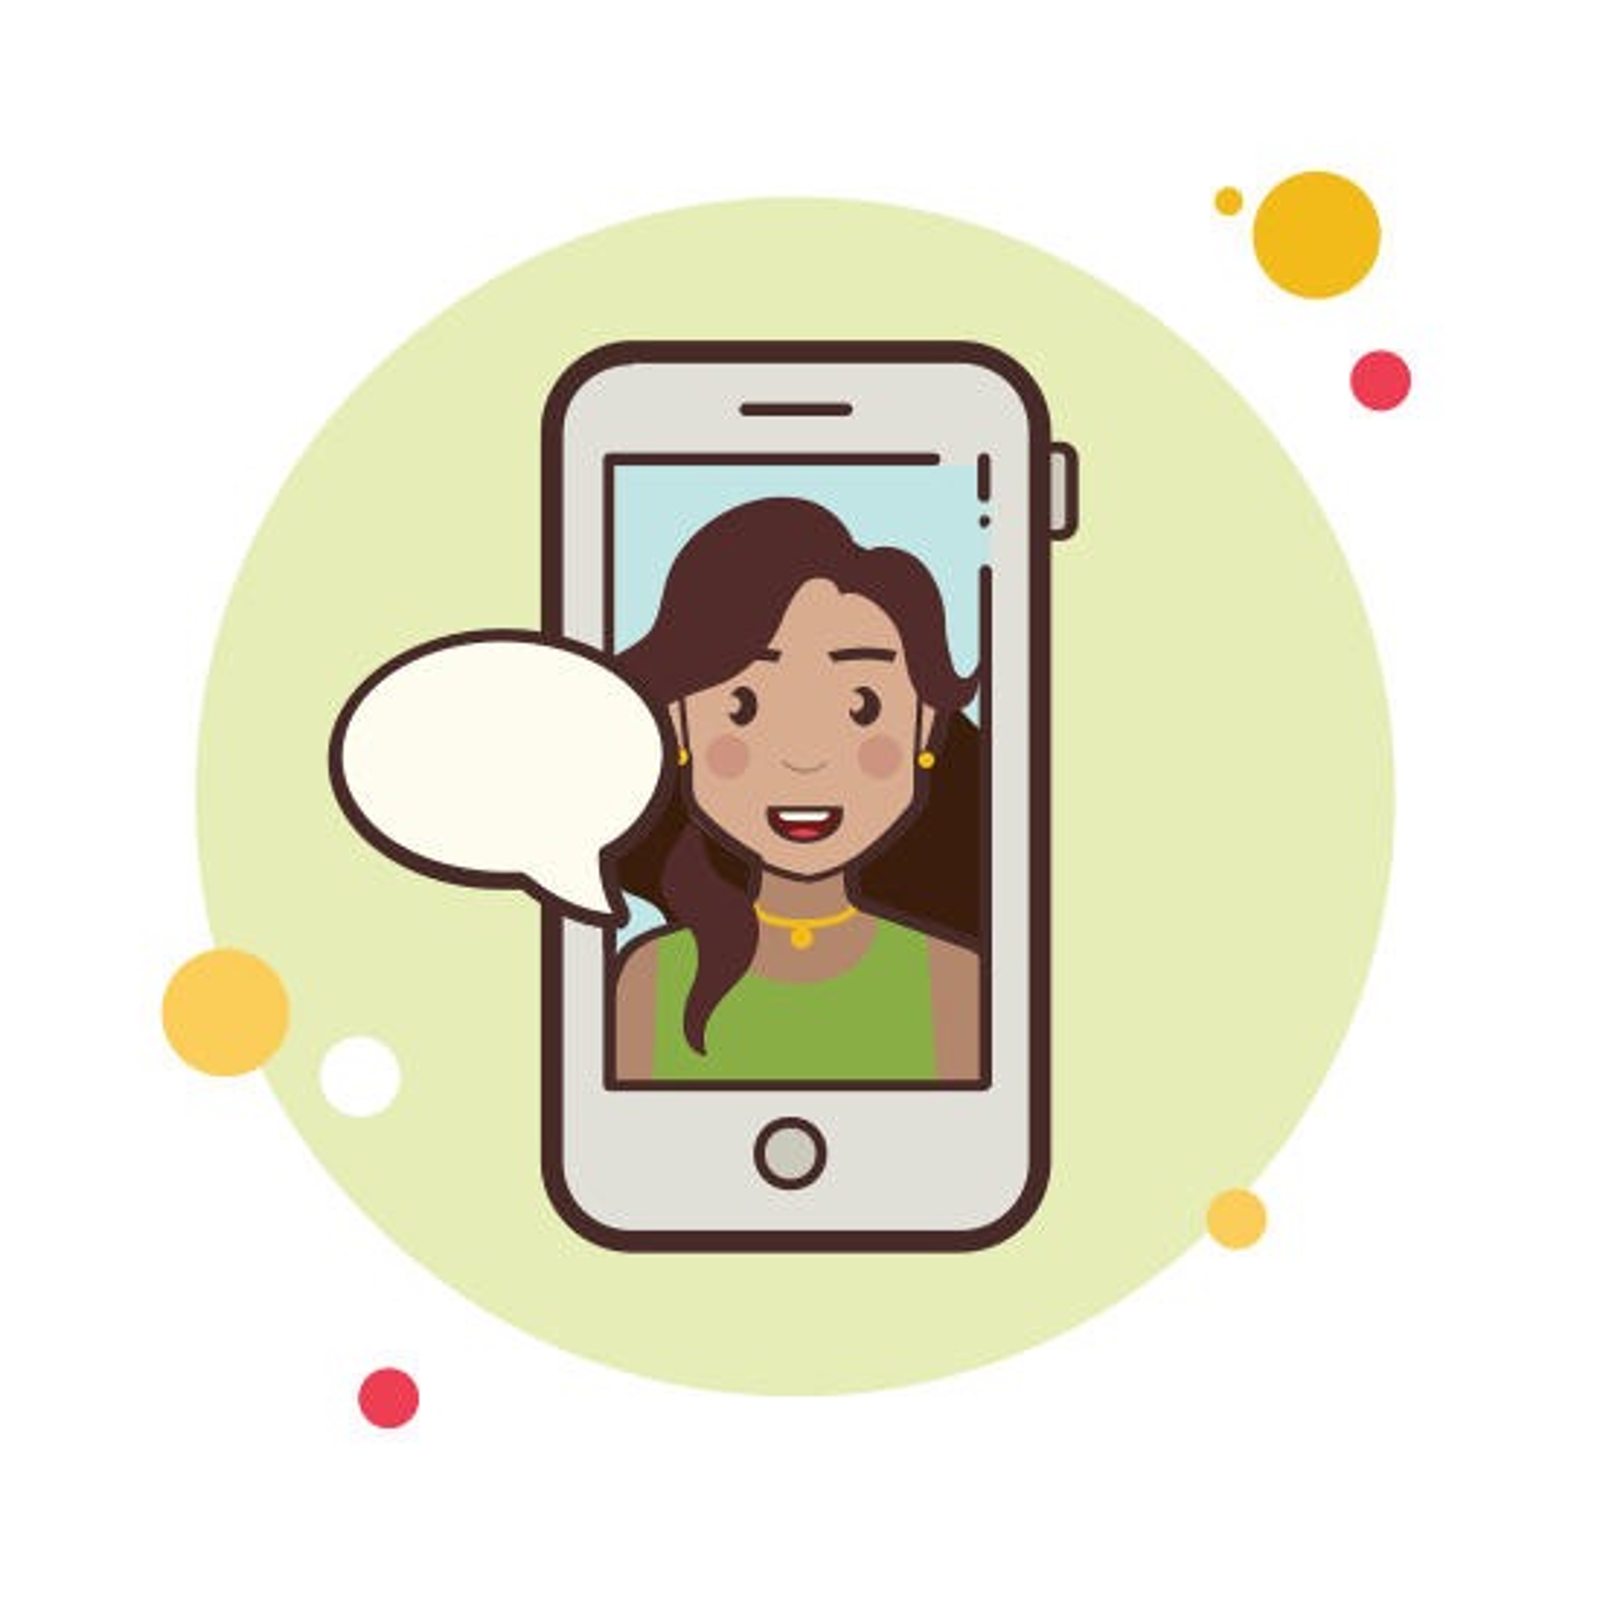 Long Hair Girl Messaging icon